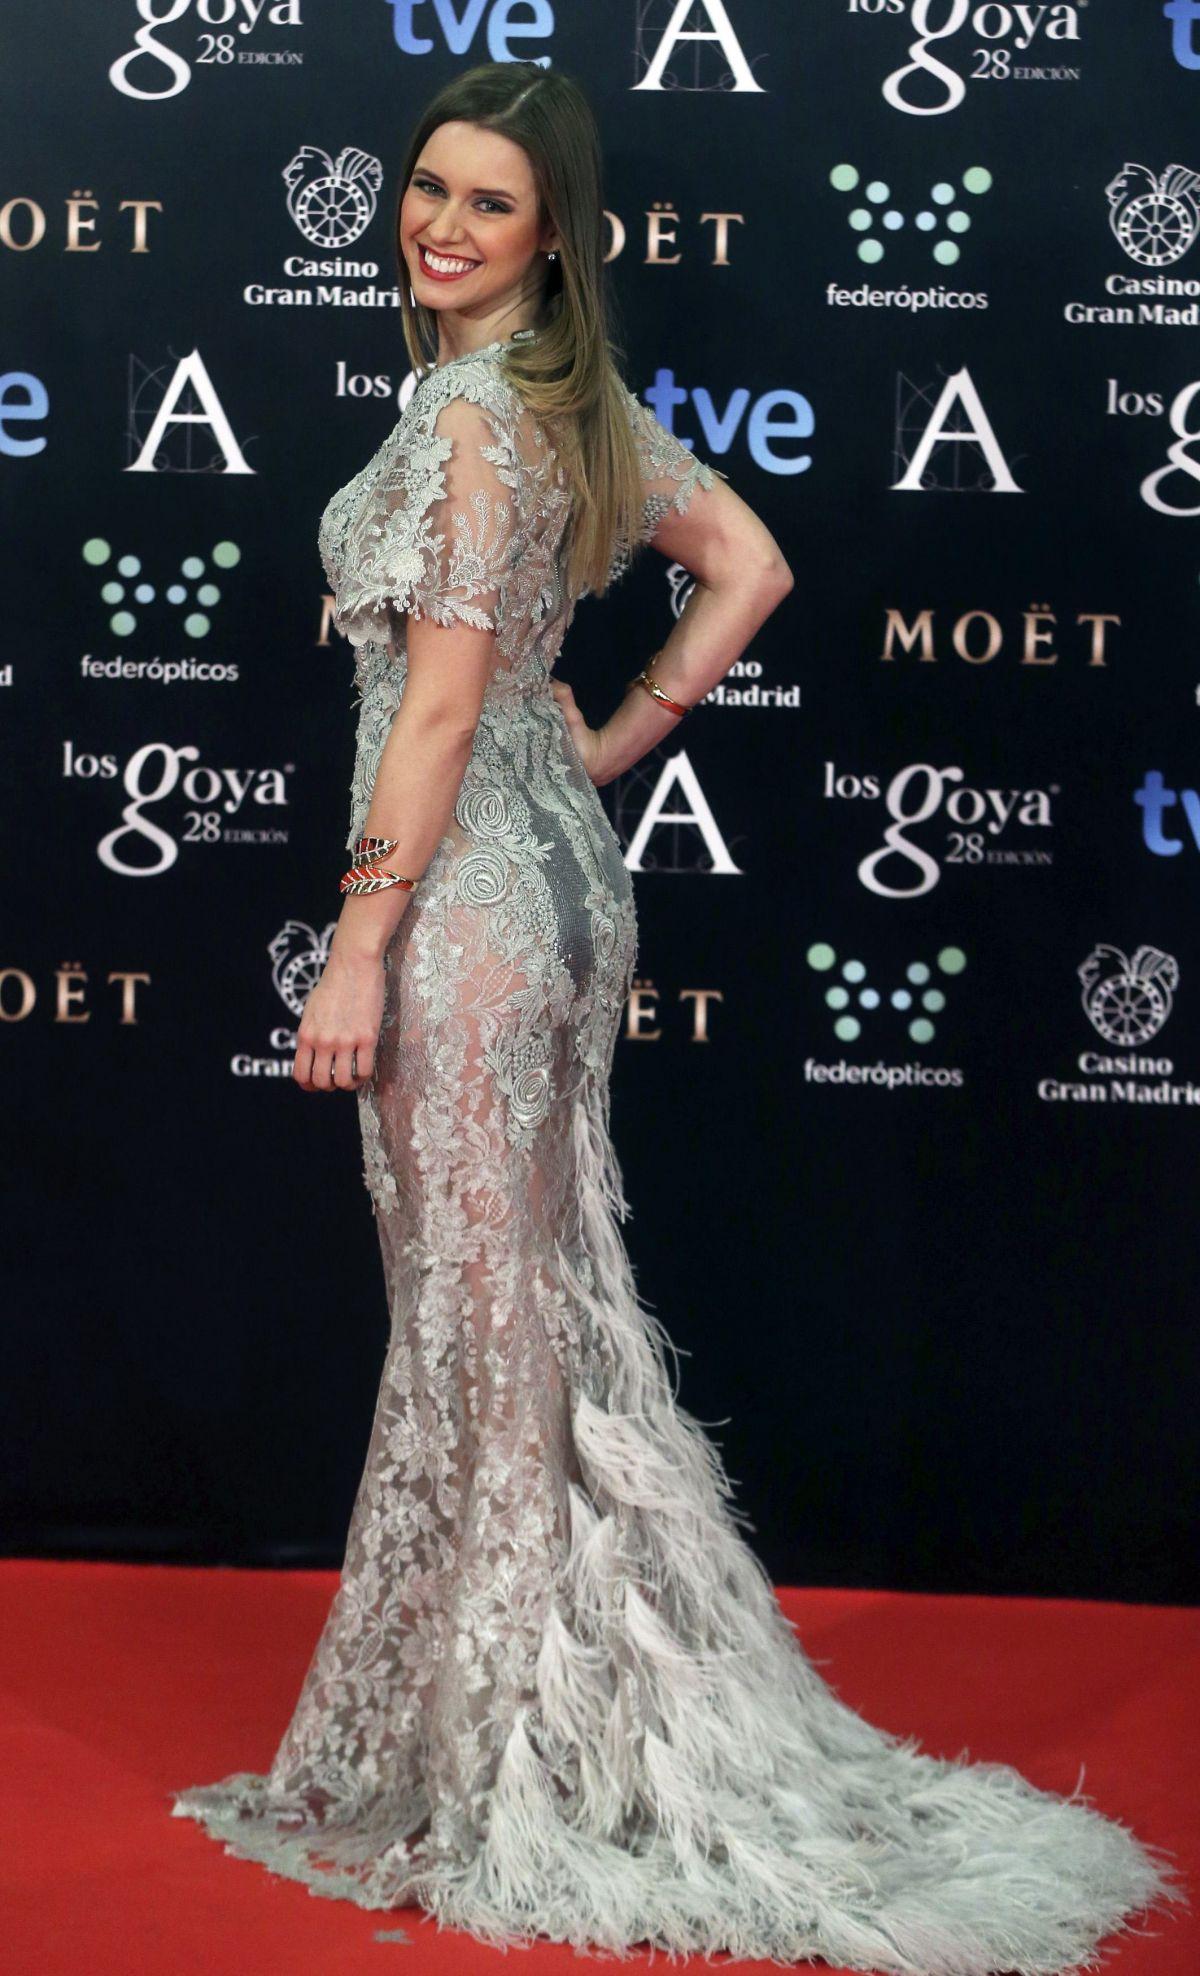 MANUELA VELLES at 2014 Goya Film Awards in Madrid